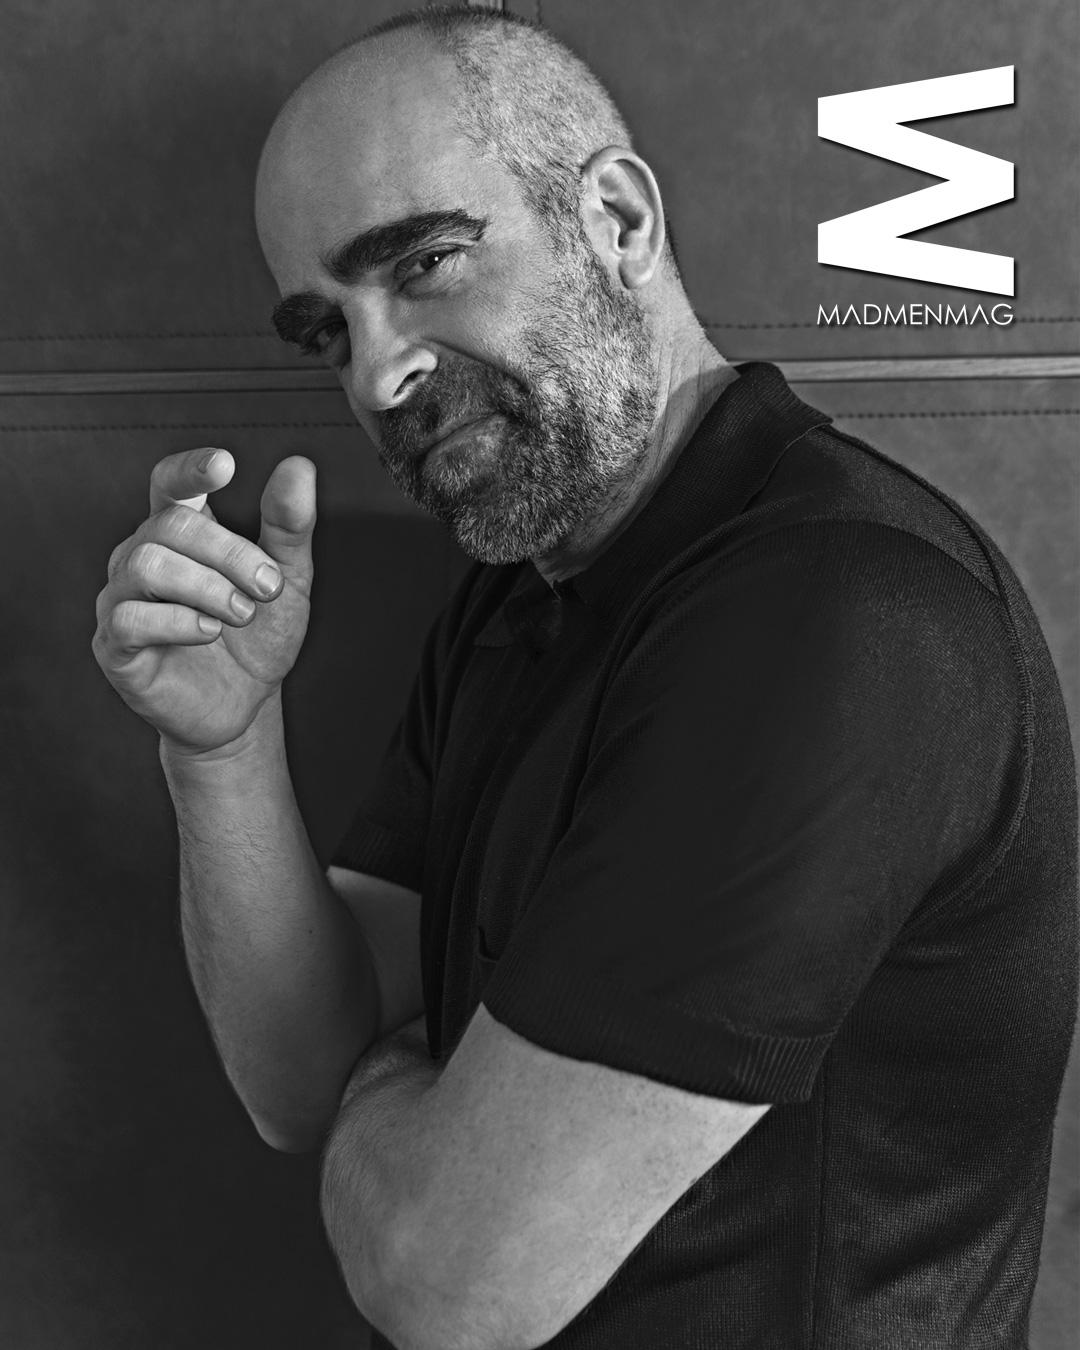 Luis-Tosar-MADMENMAG-Septiembre-2018-Vincent-Urbani-2